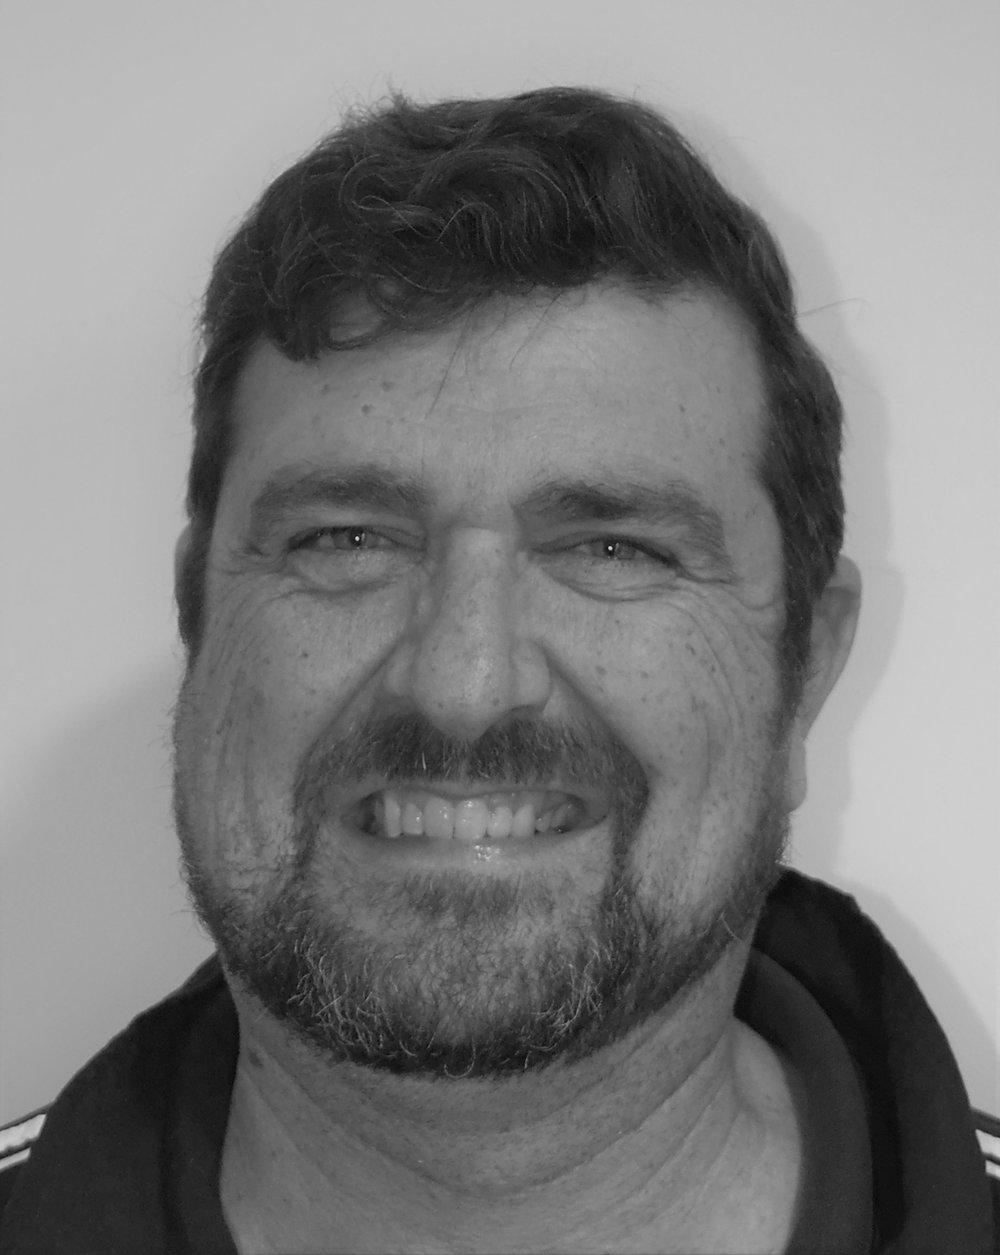 2018 - John Keller